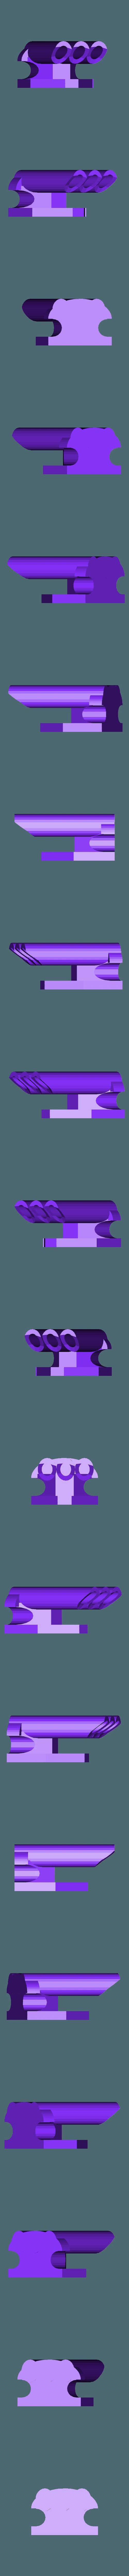 Triple_Blower.stl Download free STL file Gaslands Greebles (Blowers and Burners) • Design to 3D print, Ellie_Valkyrie